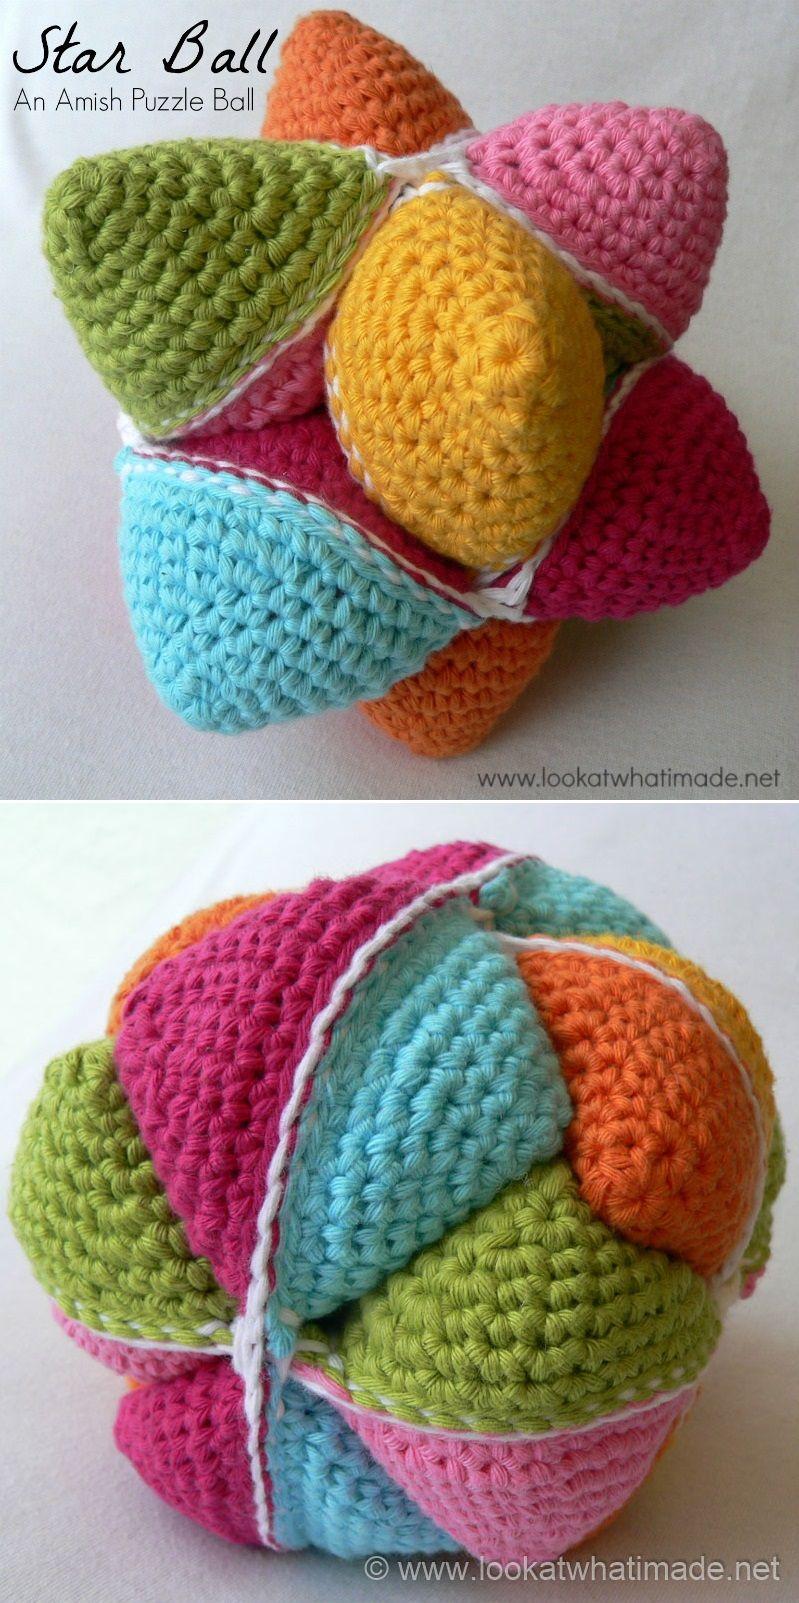 Pin de Anne Chauvin en Crochet   Pinterest   Bebe, Ganchillo y TDAH